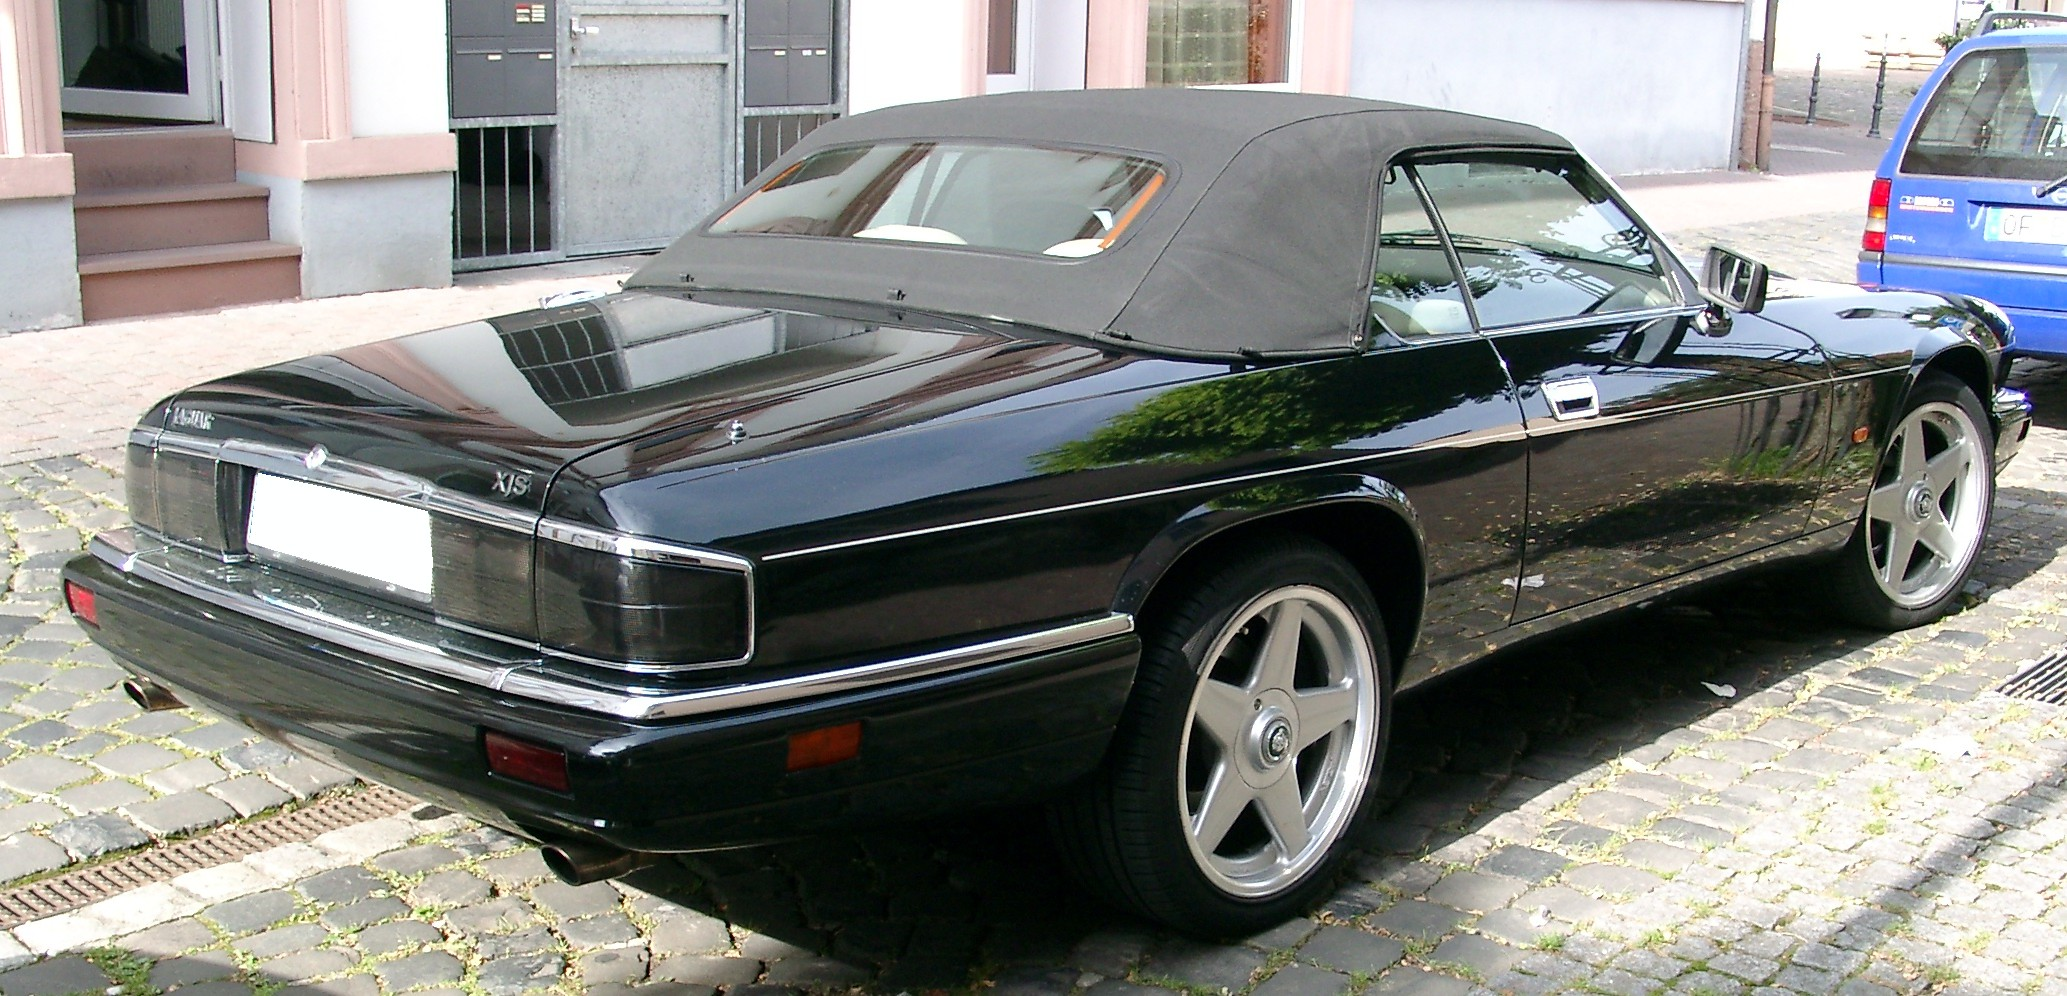 file jaguar xjs cabrio rear wikimedia commons. Black Bedroom Furniture Sets. Home Design Ideas